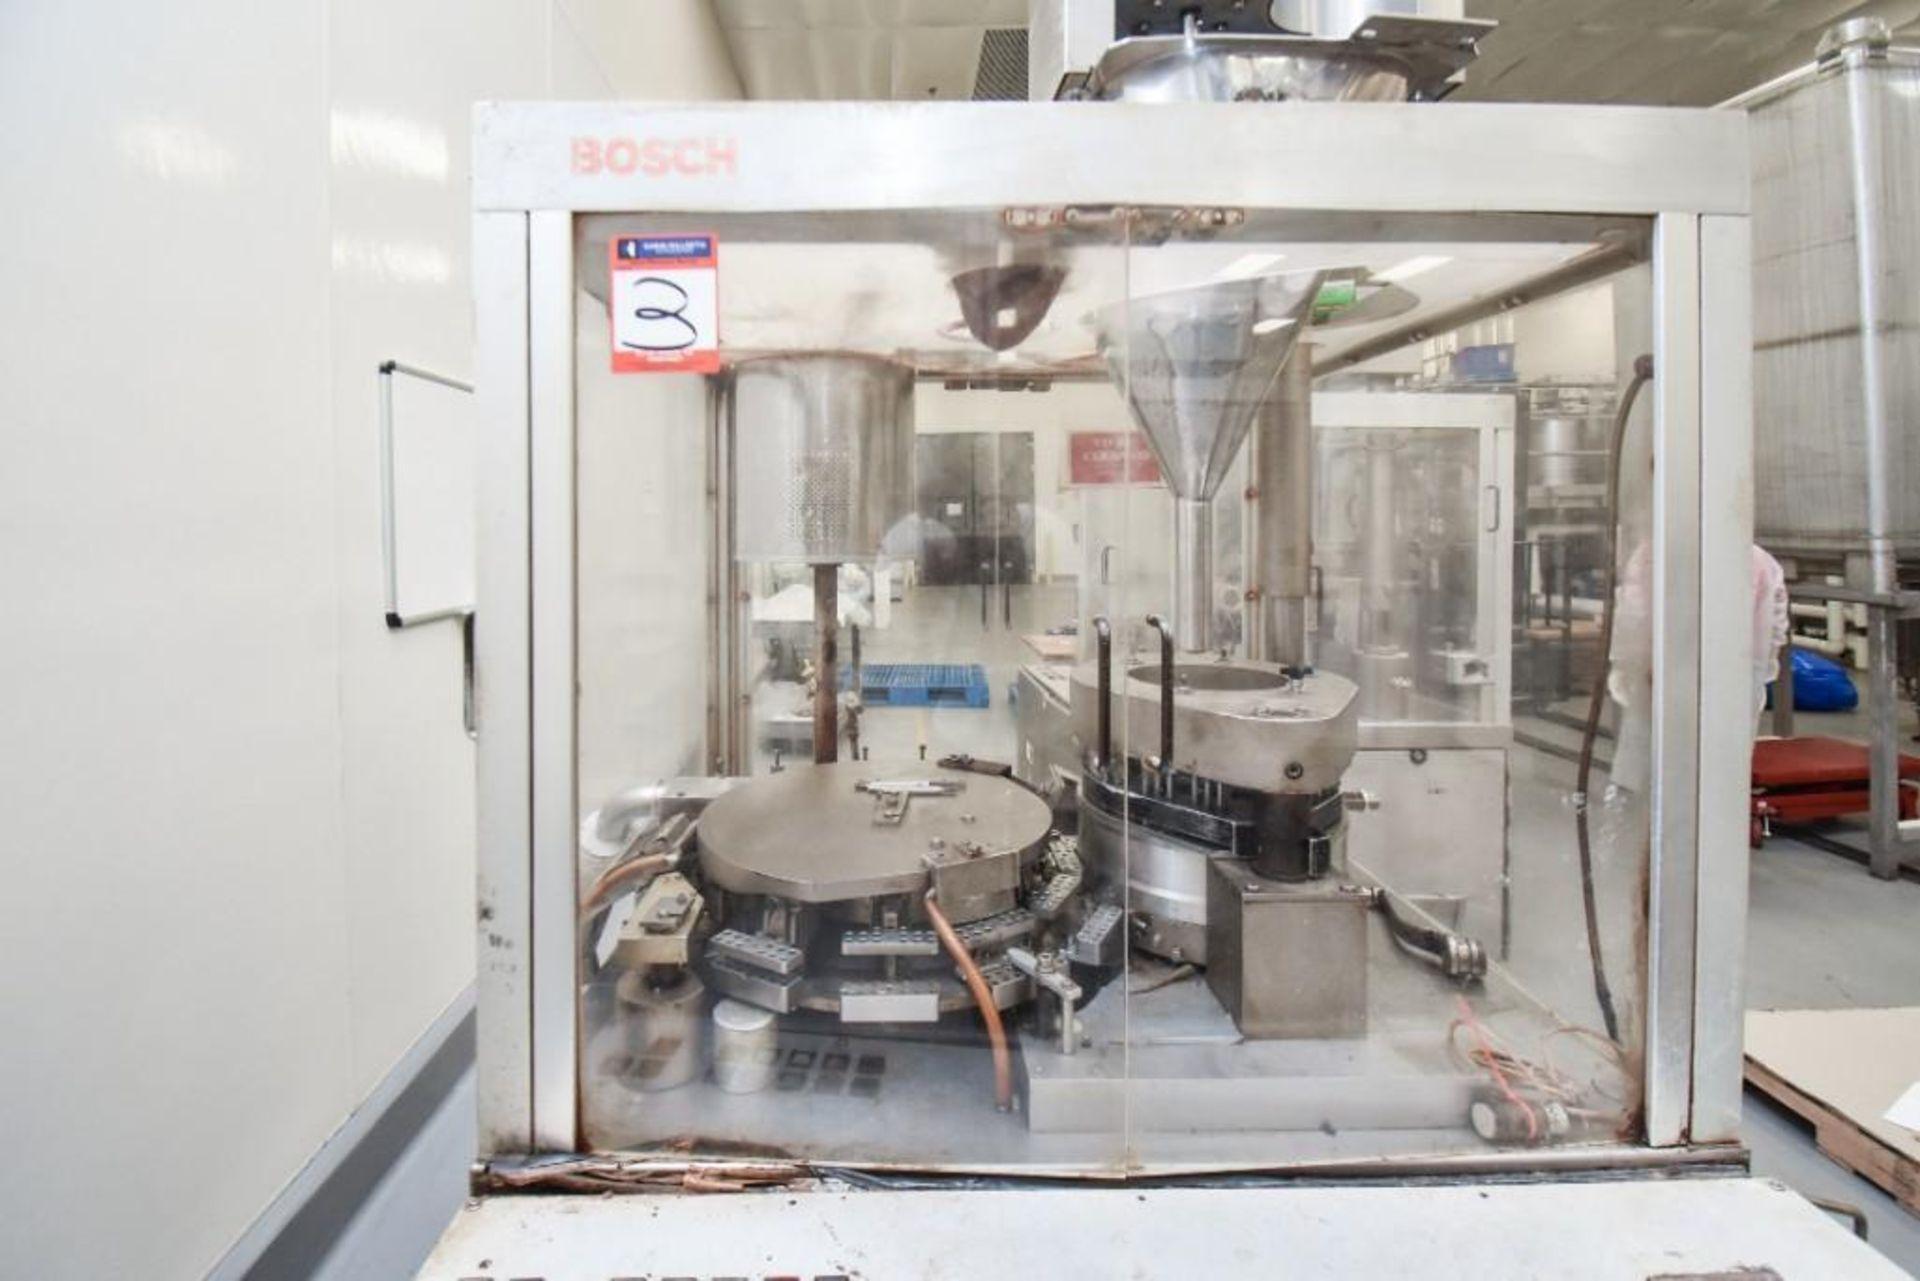 Bosch 1500 Encapsulation Machine - Image 2 of 11